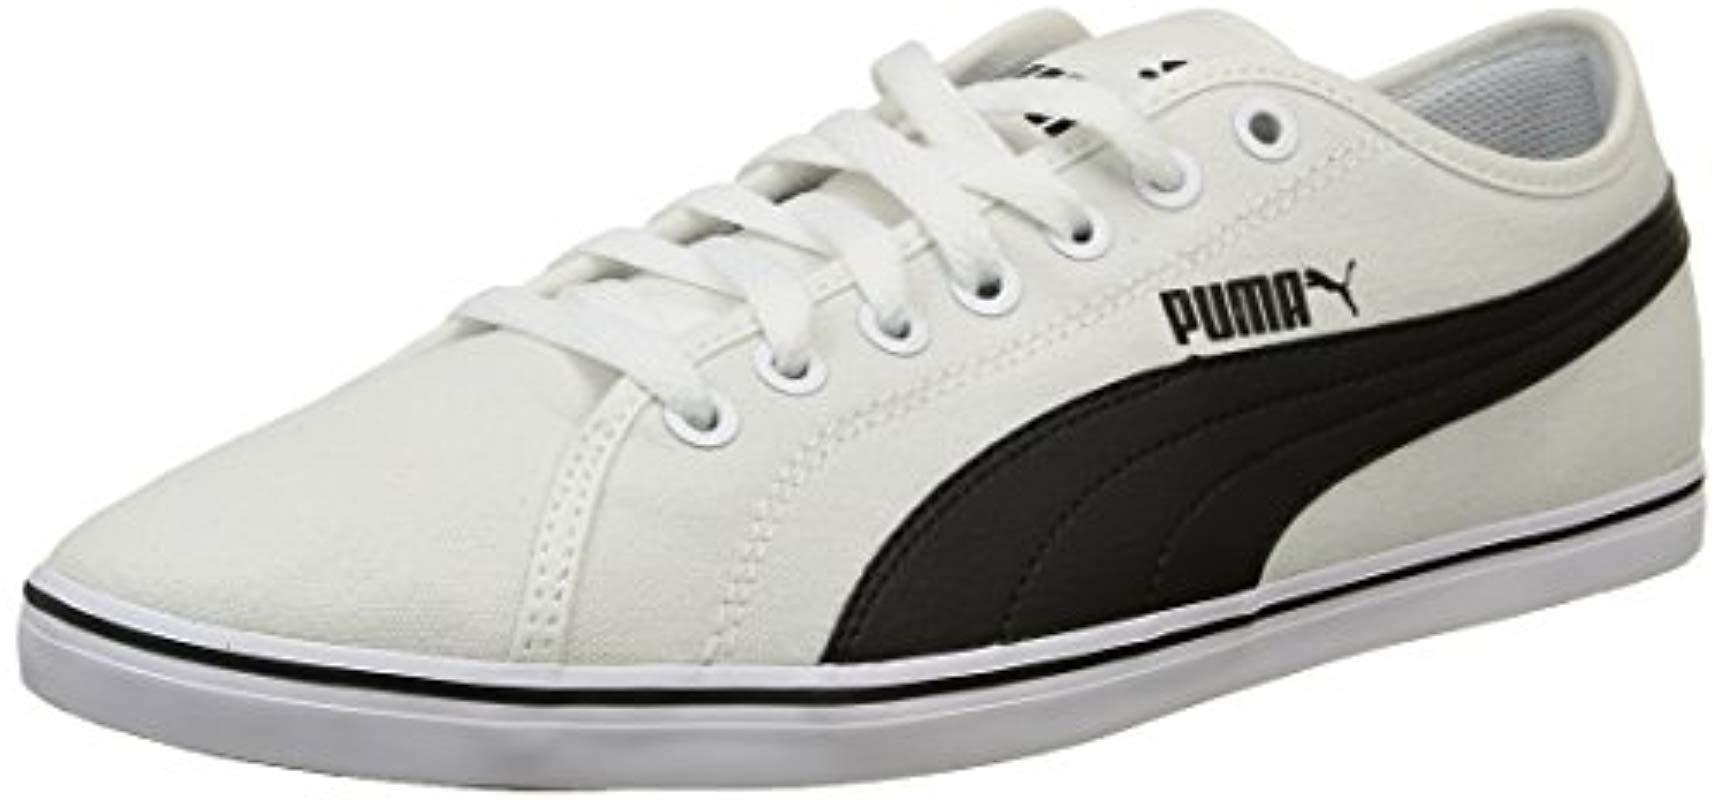 Puma Unisex Adults  Elsu V2 Cv Low-top Sneakers Black in Black for ... 90620d77f